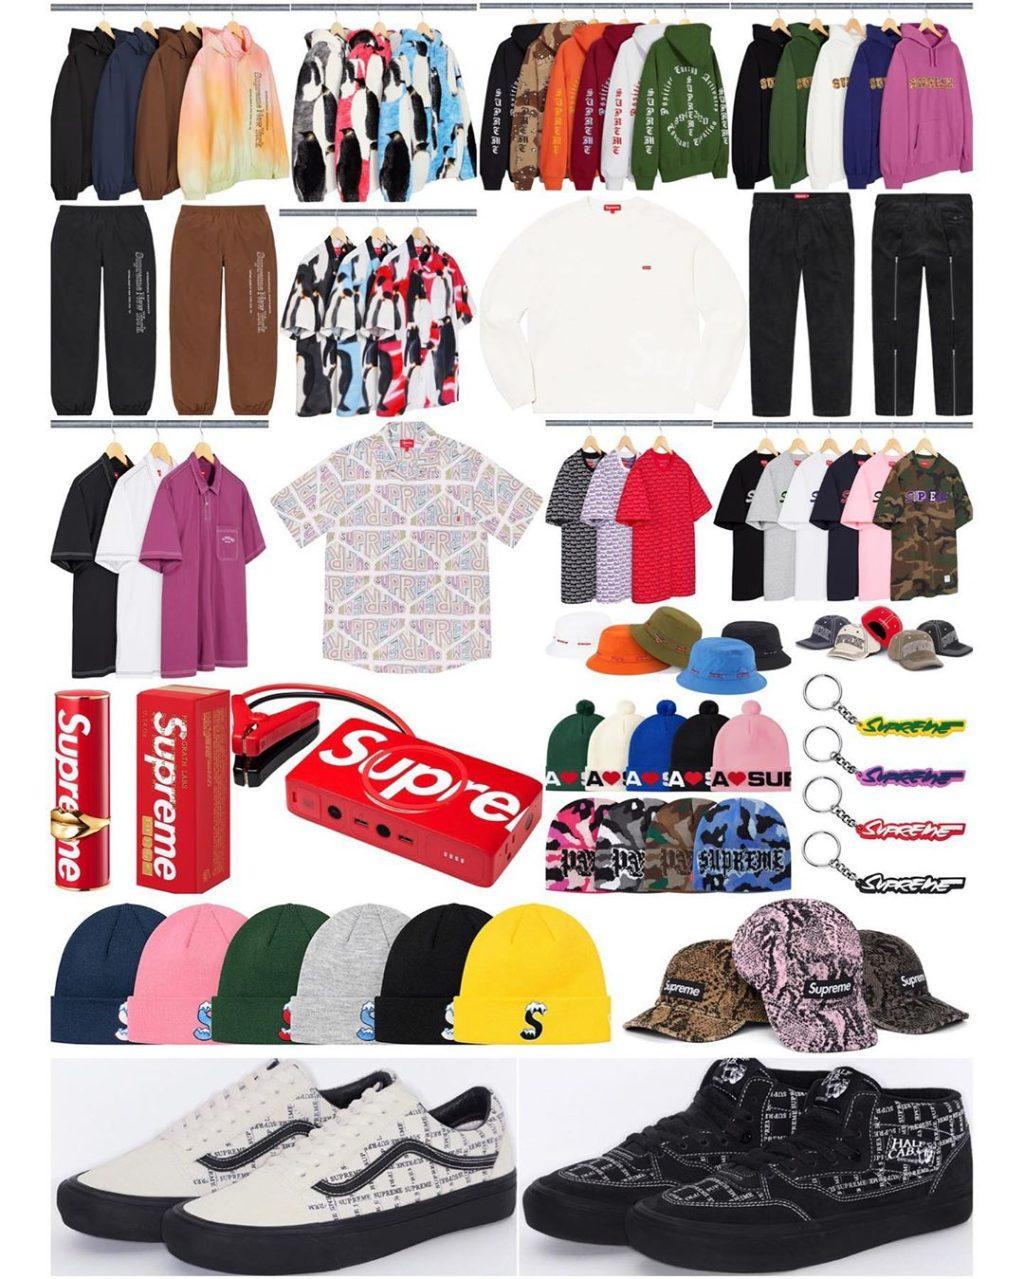 supreme-online-store-20200912-week3-release-items-droplist